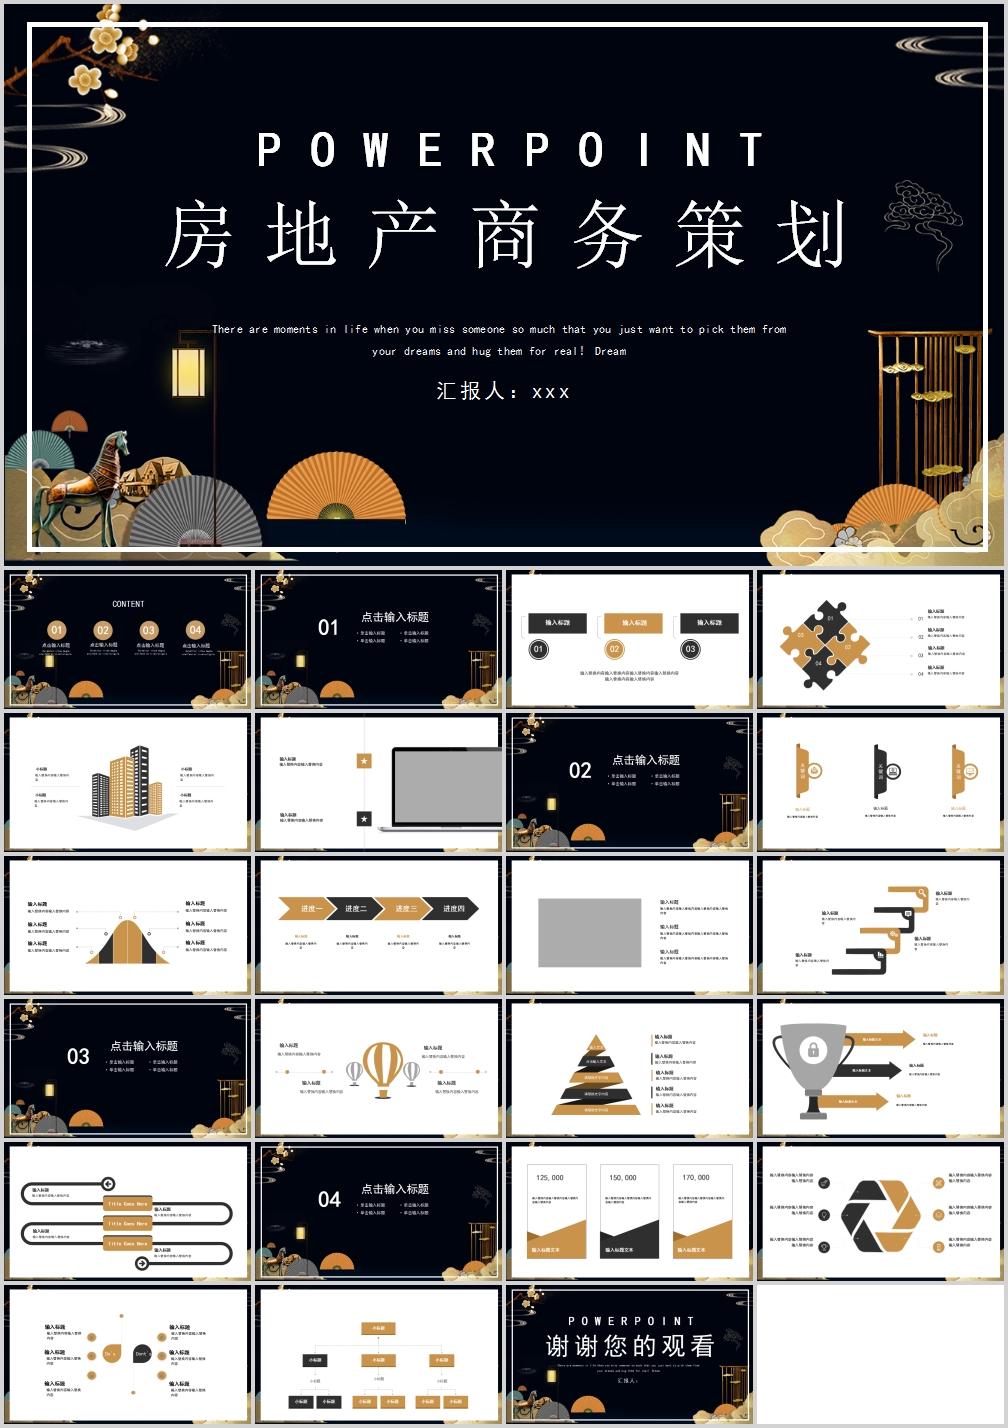 【PPT】国潮彩马房地产商务策划PPT模板-爱资源分享